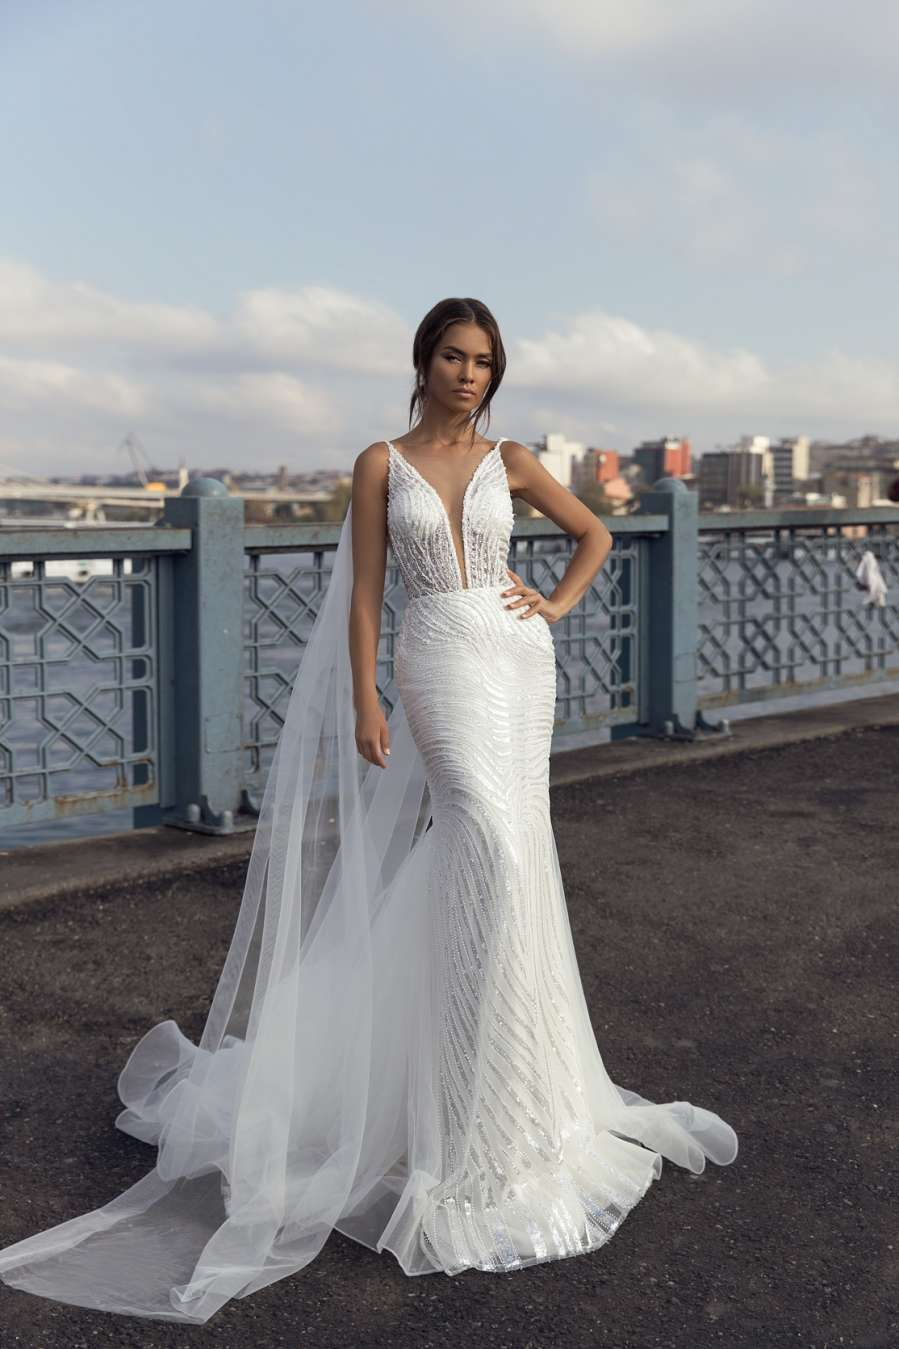 свадебное платье Khaleesi_(1).900x900